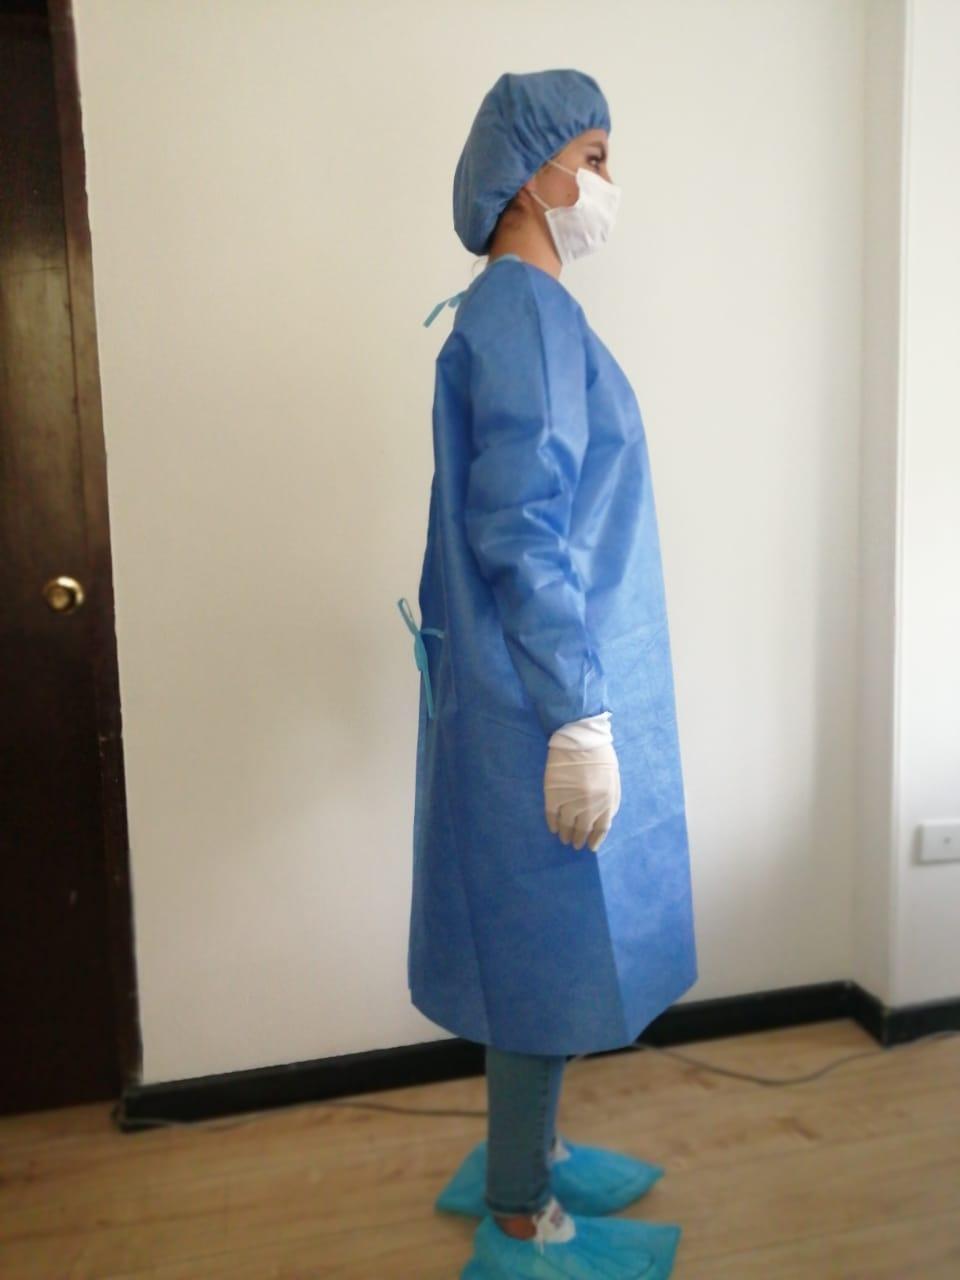 batas quirúrgicas en tela SMS